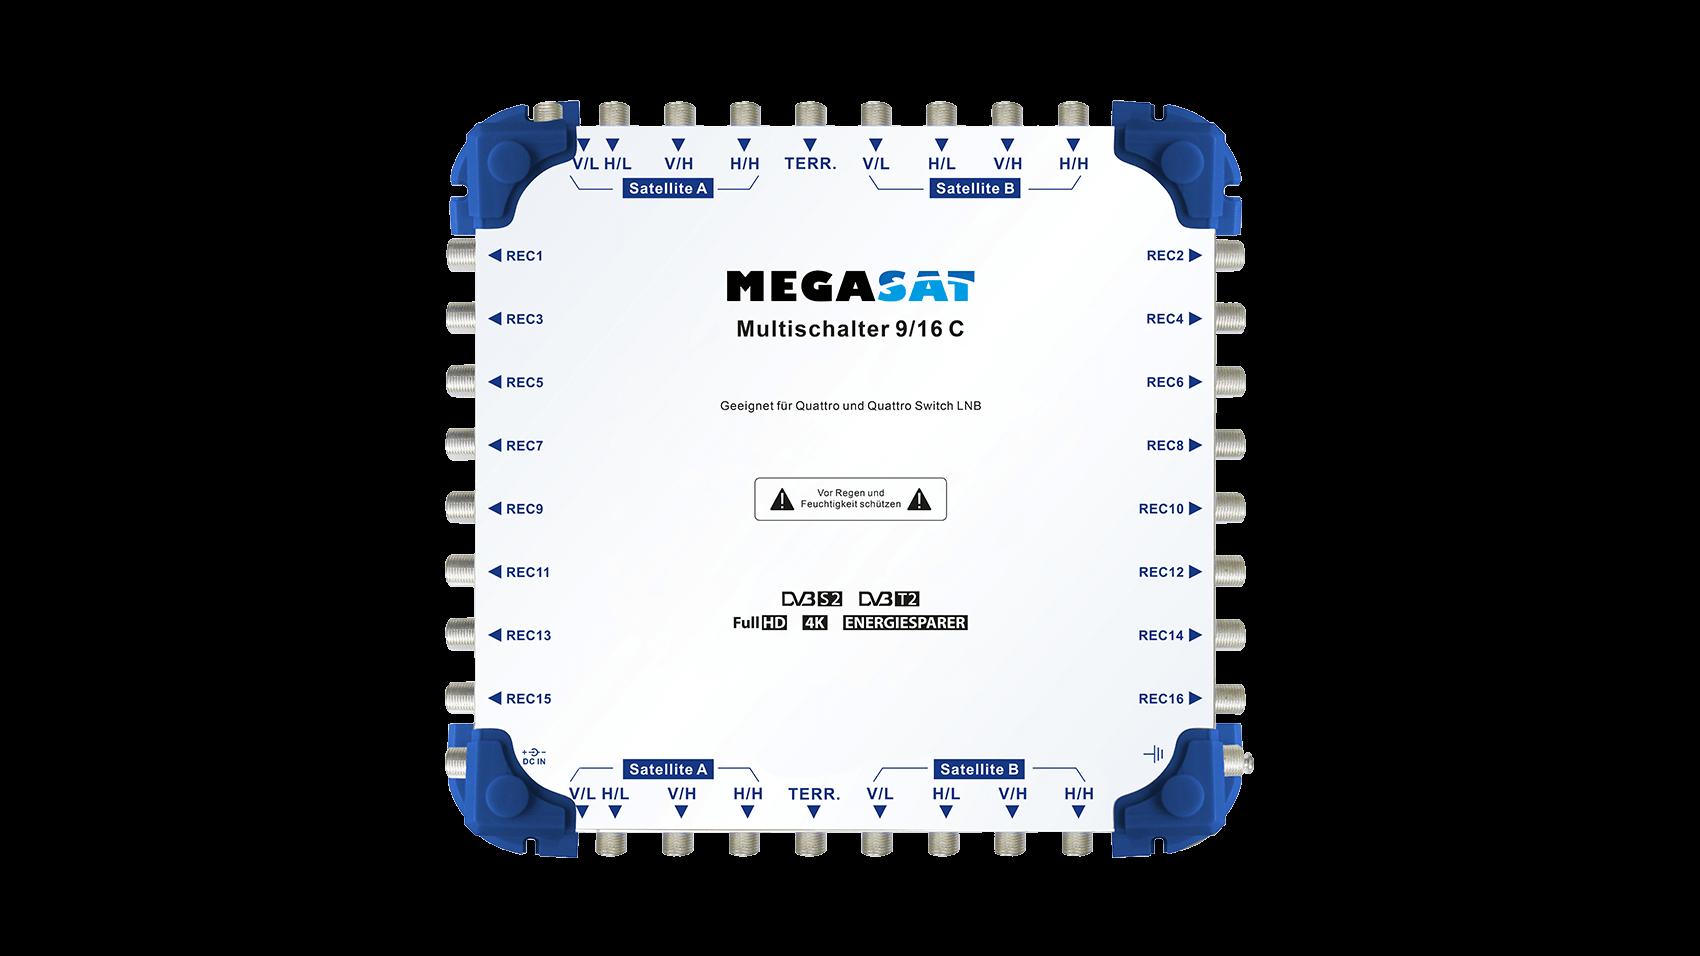 megasat_multischalter_9_16_c_frontansicht